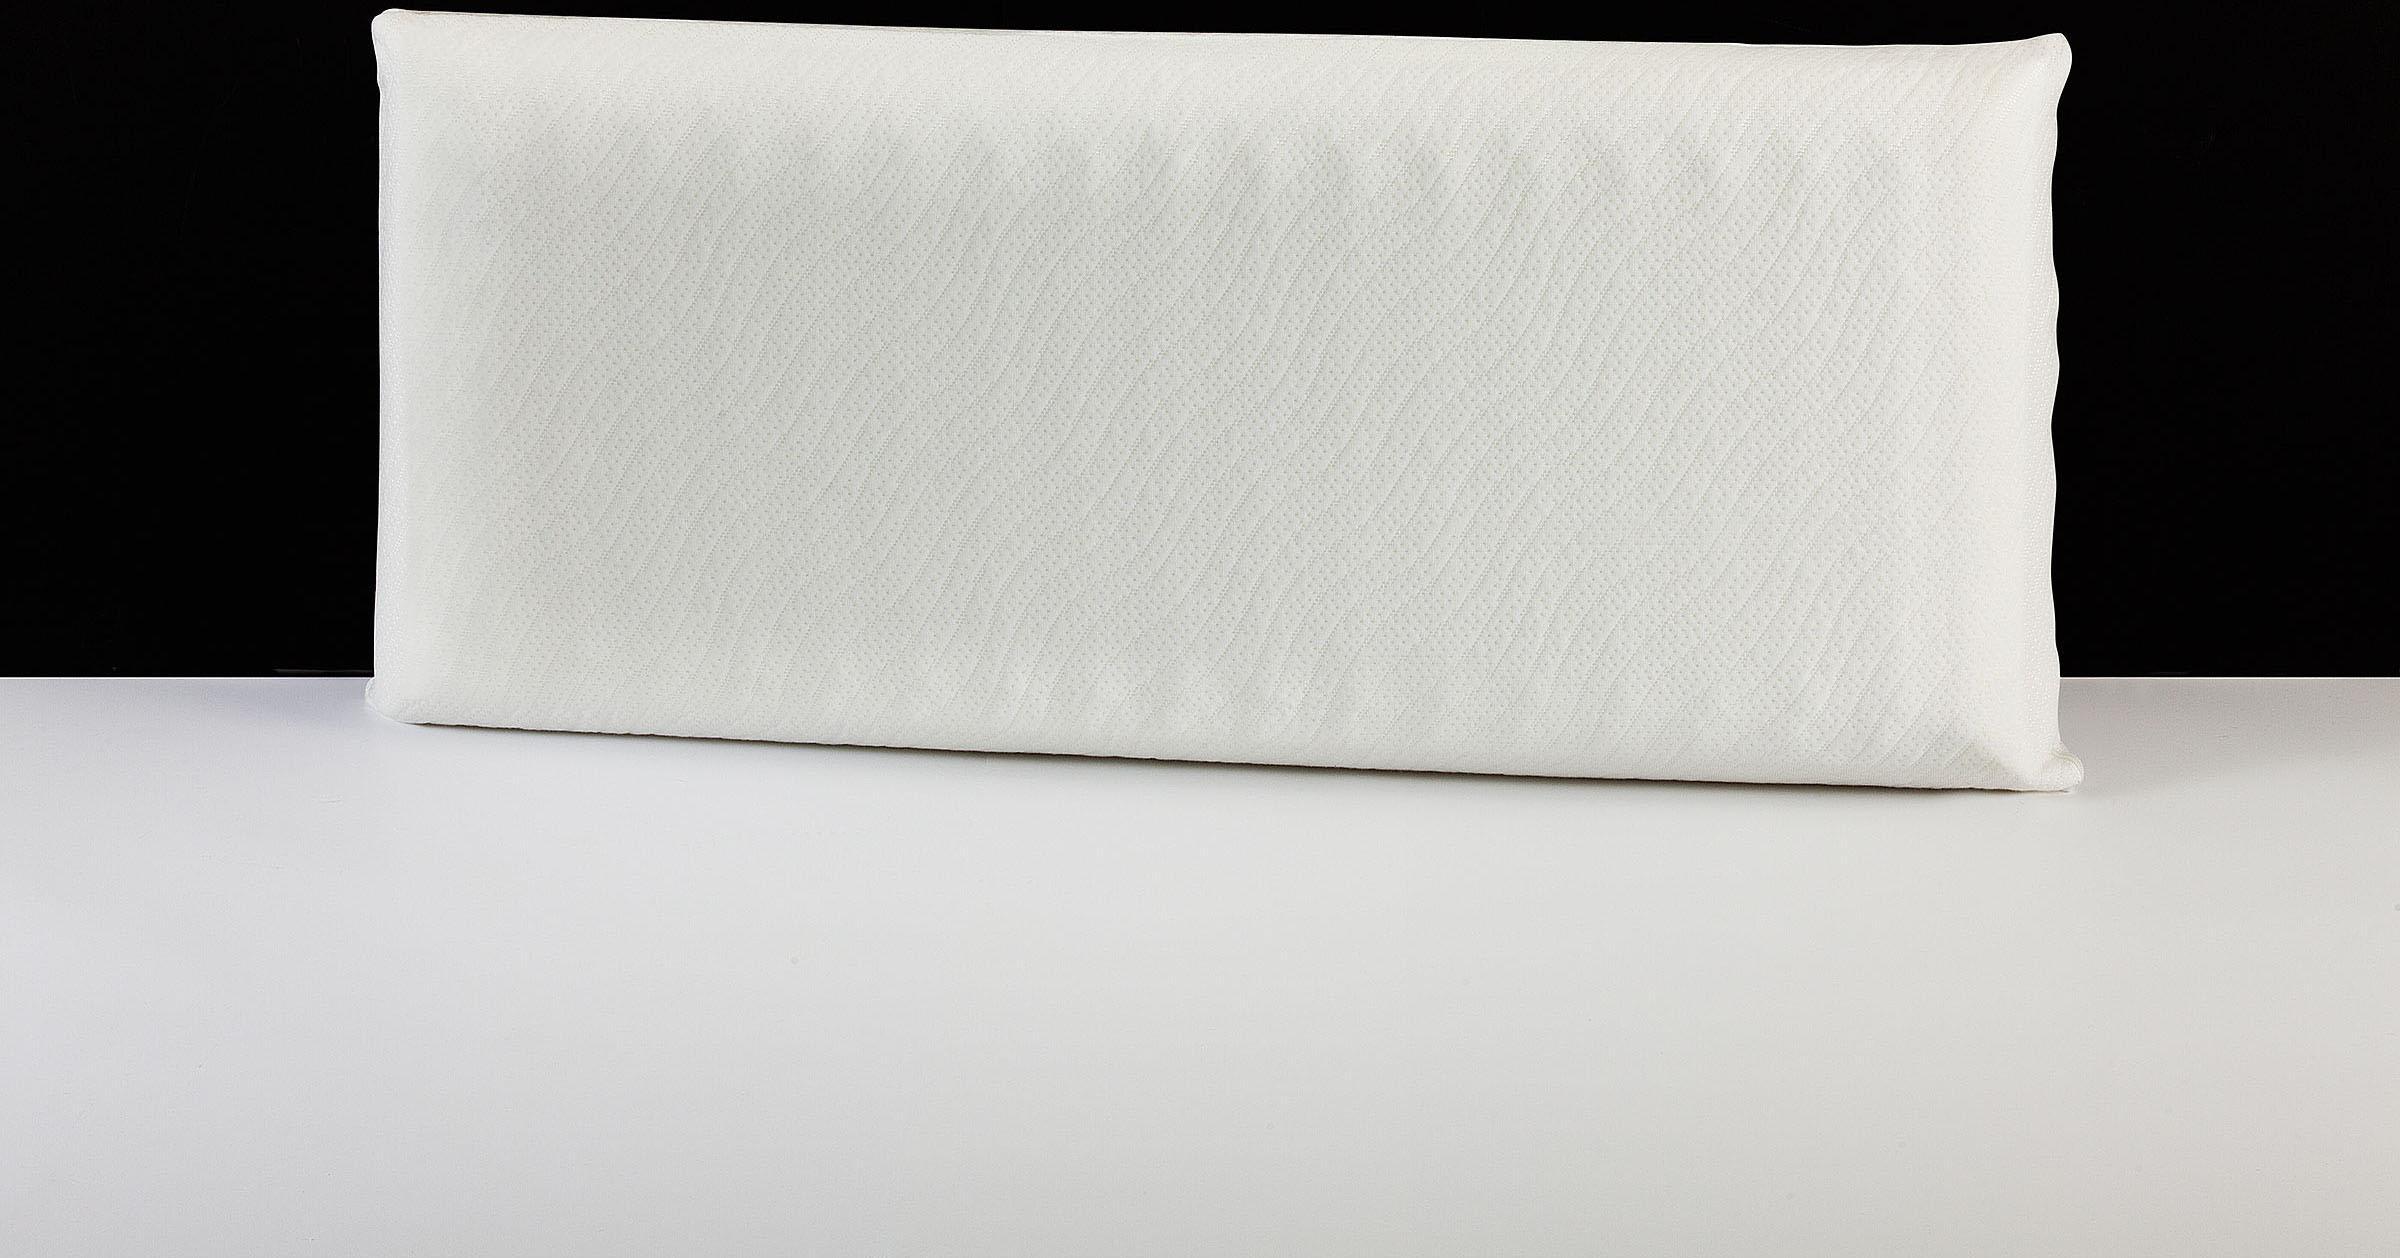 Nackenstützkissen Ultrasoft Memory DI QUATTRO Bezug: 100% Polyester